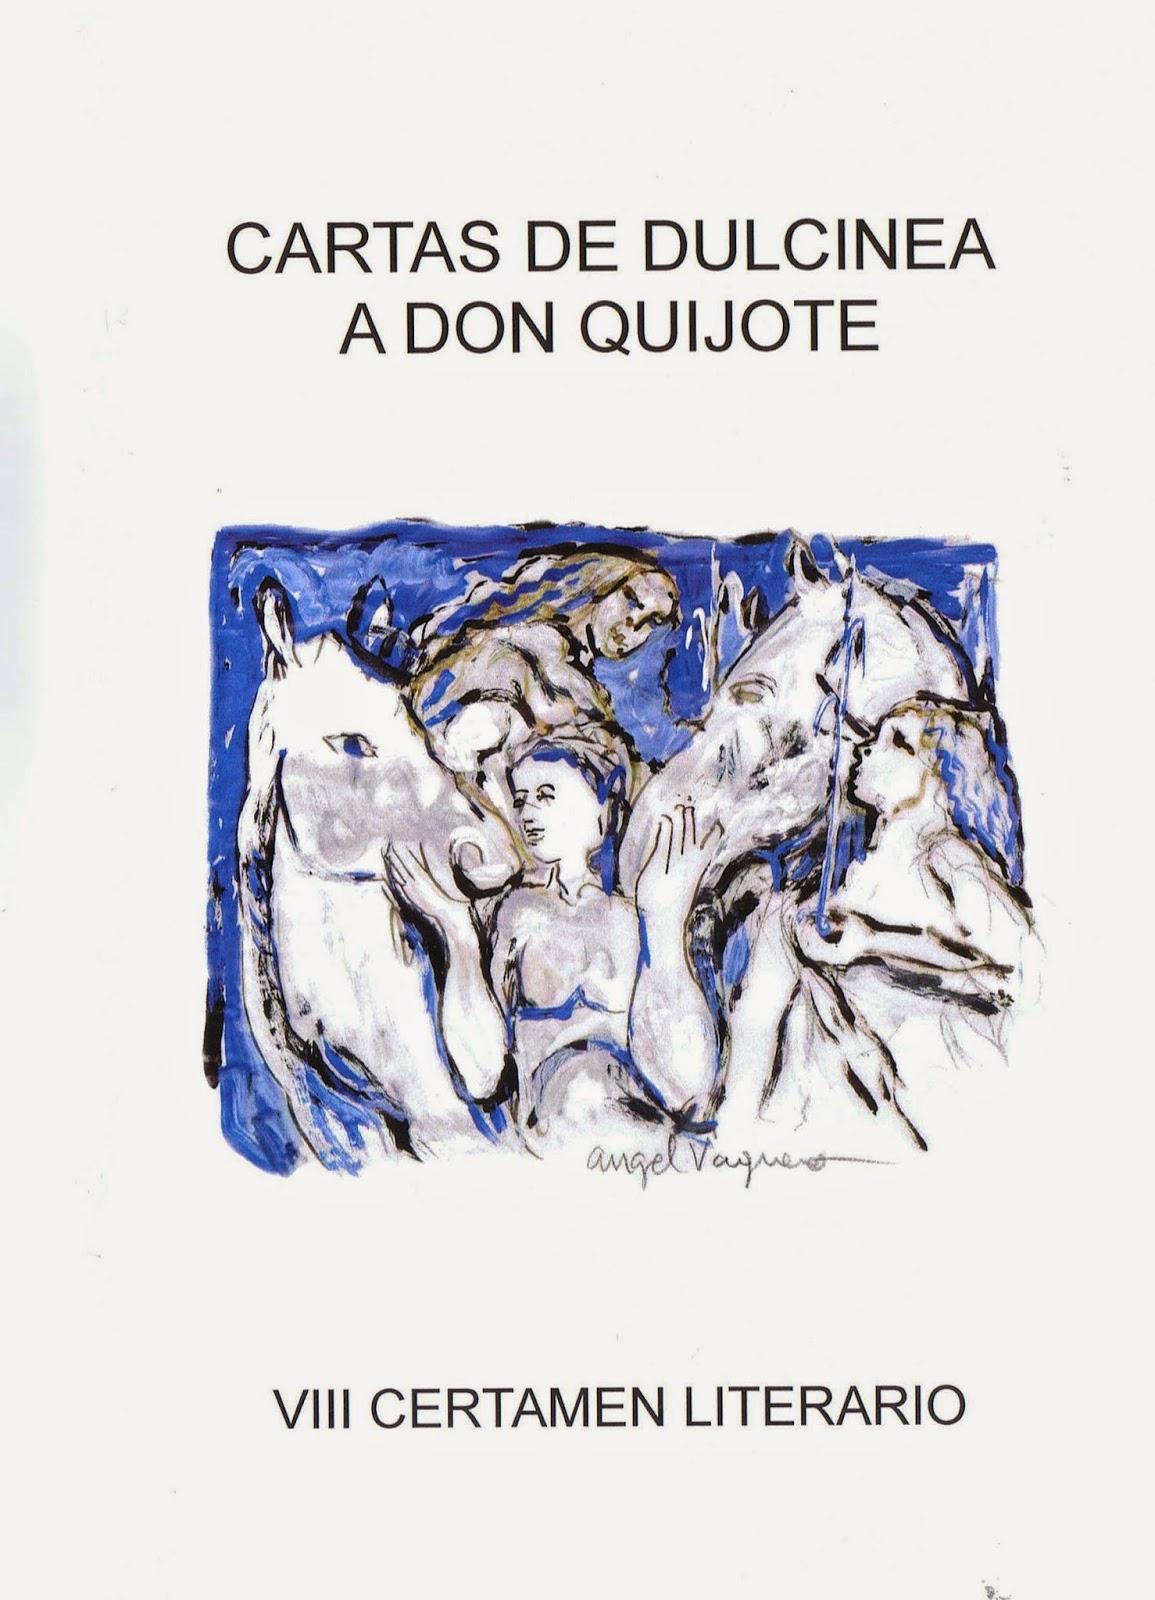 dulcinea don quichotte